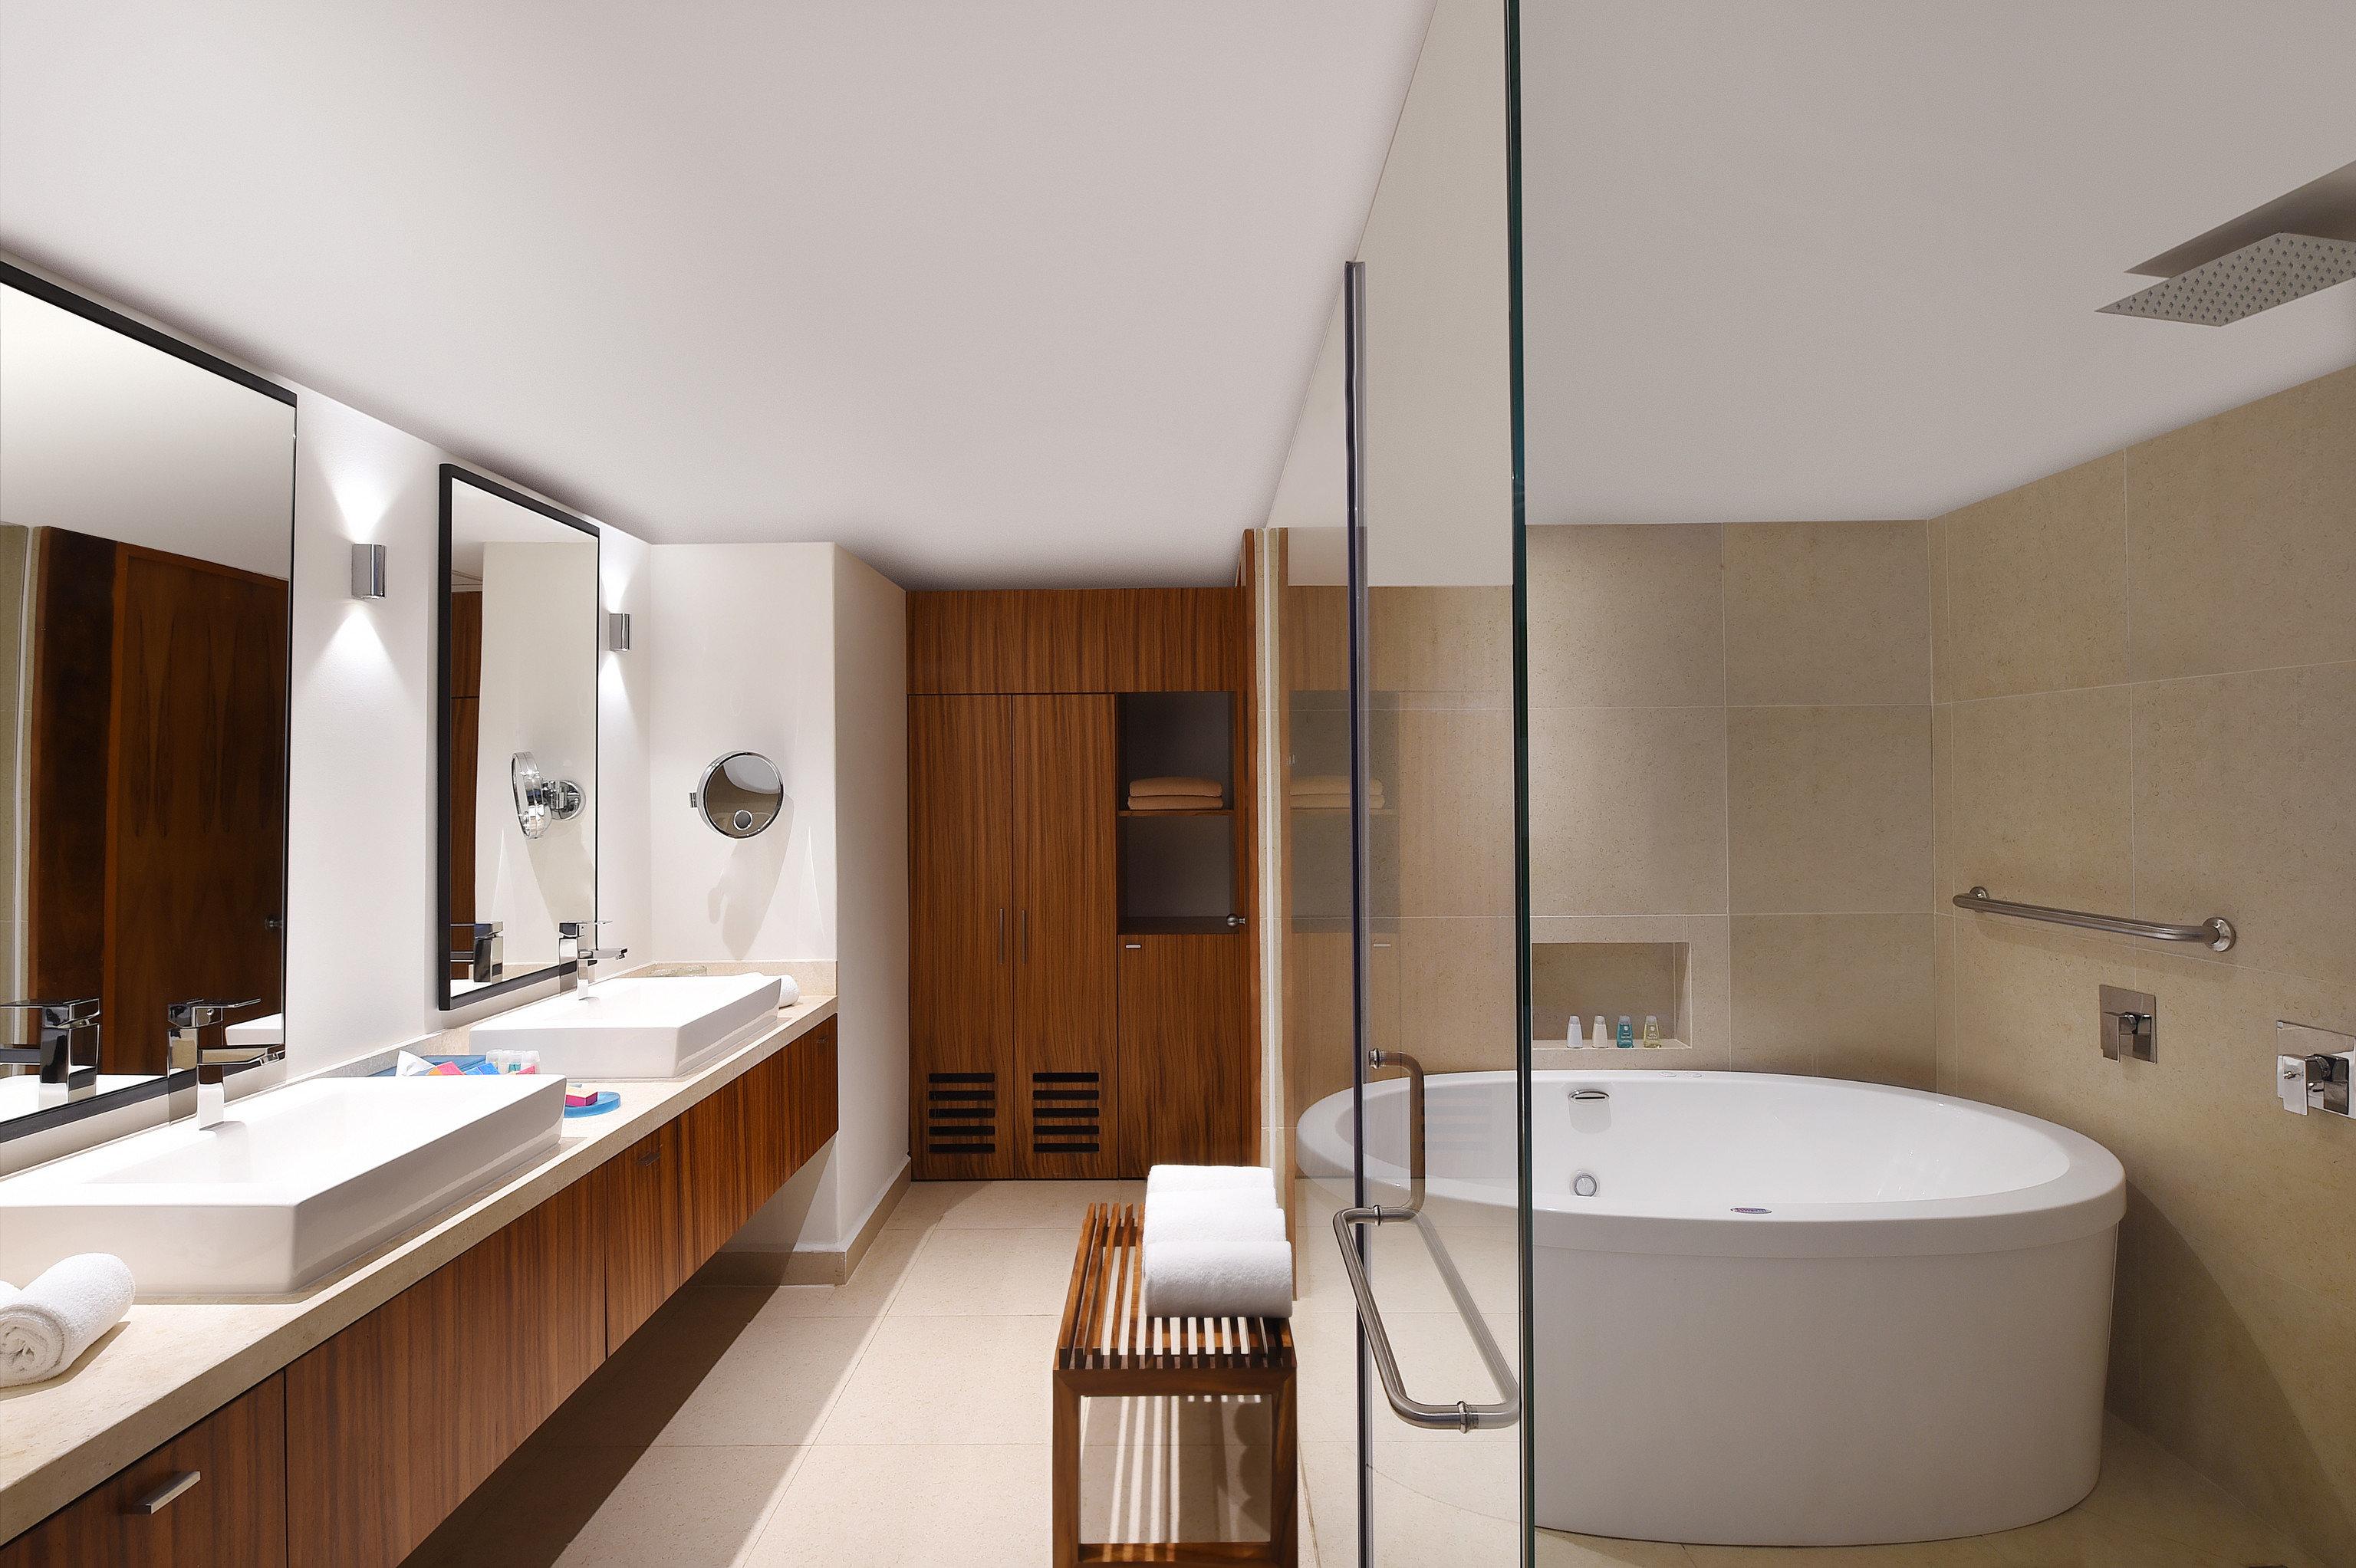 bathroom Architecture sink toilet Suite interior designer tub bathtub Bath